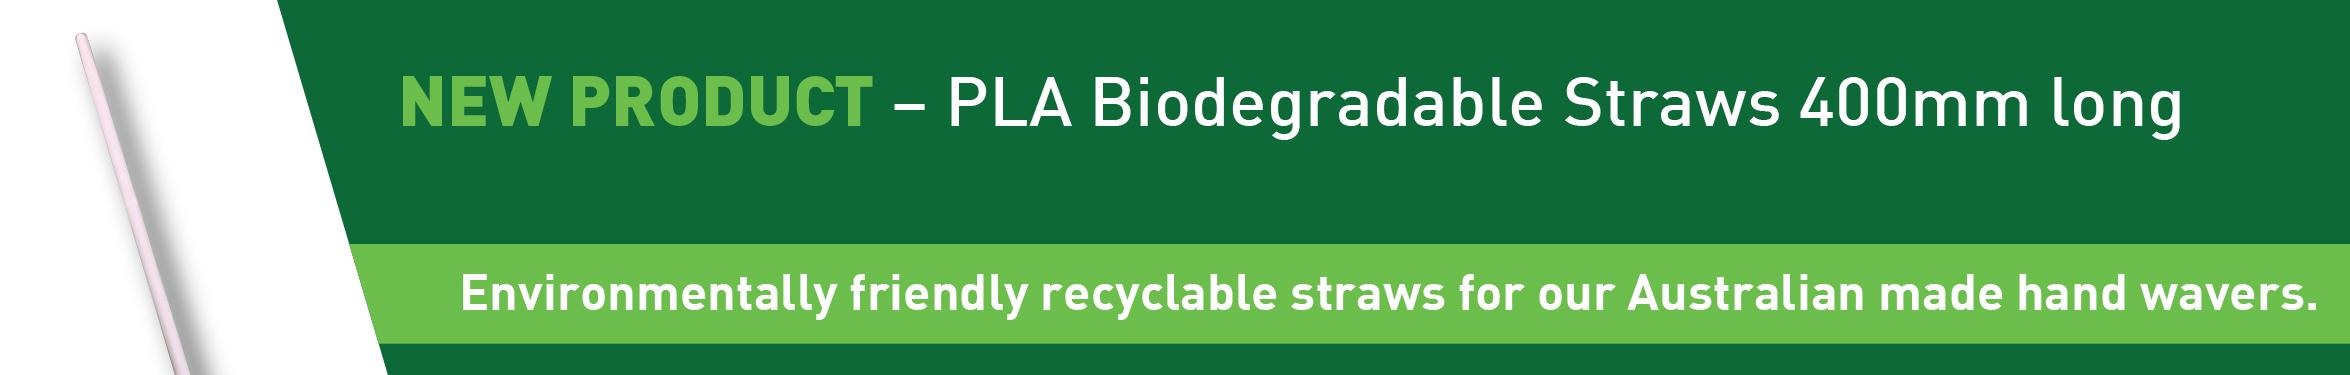 PLA Biodegradable Straws